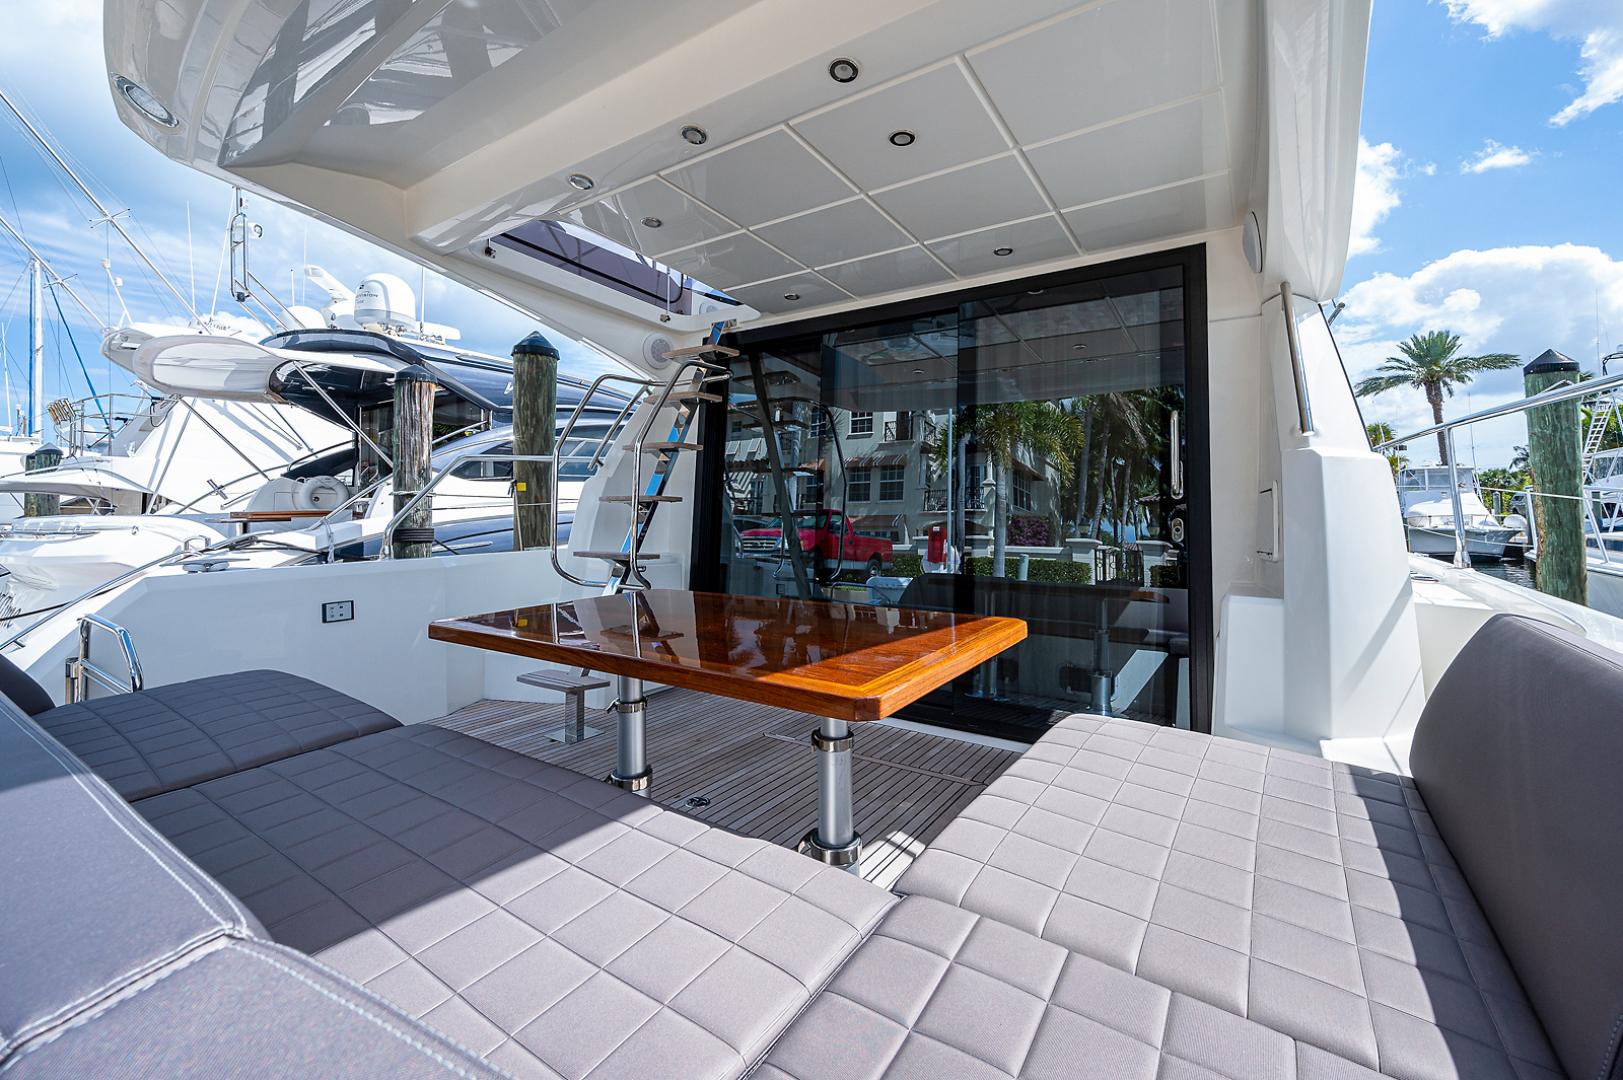 Prestige-460 Flybridge 2018-SEAQUEL Palm Beach Gardens-Florida-United States-Cockpit -1351138 | Thumbnail